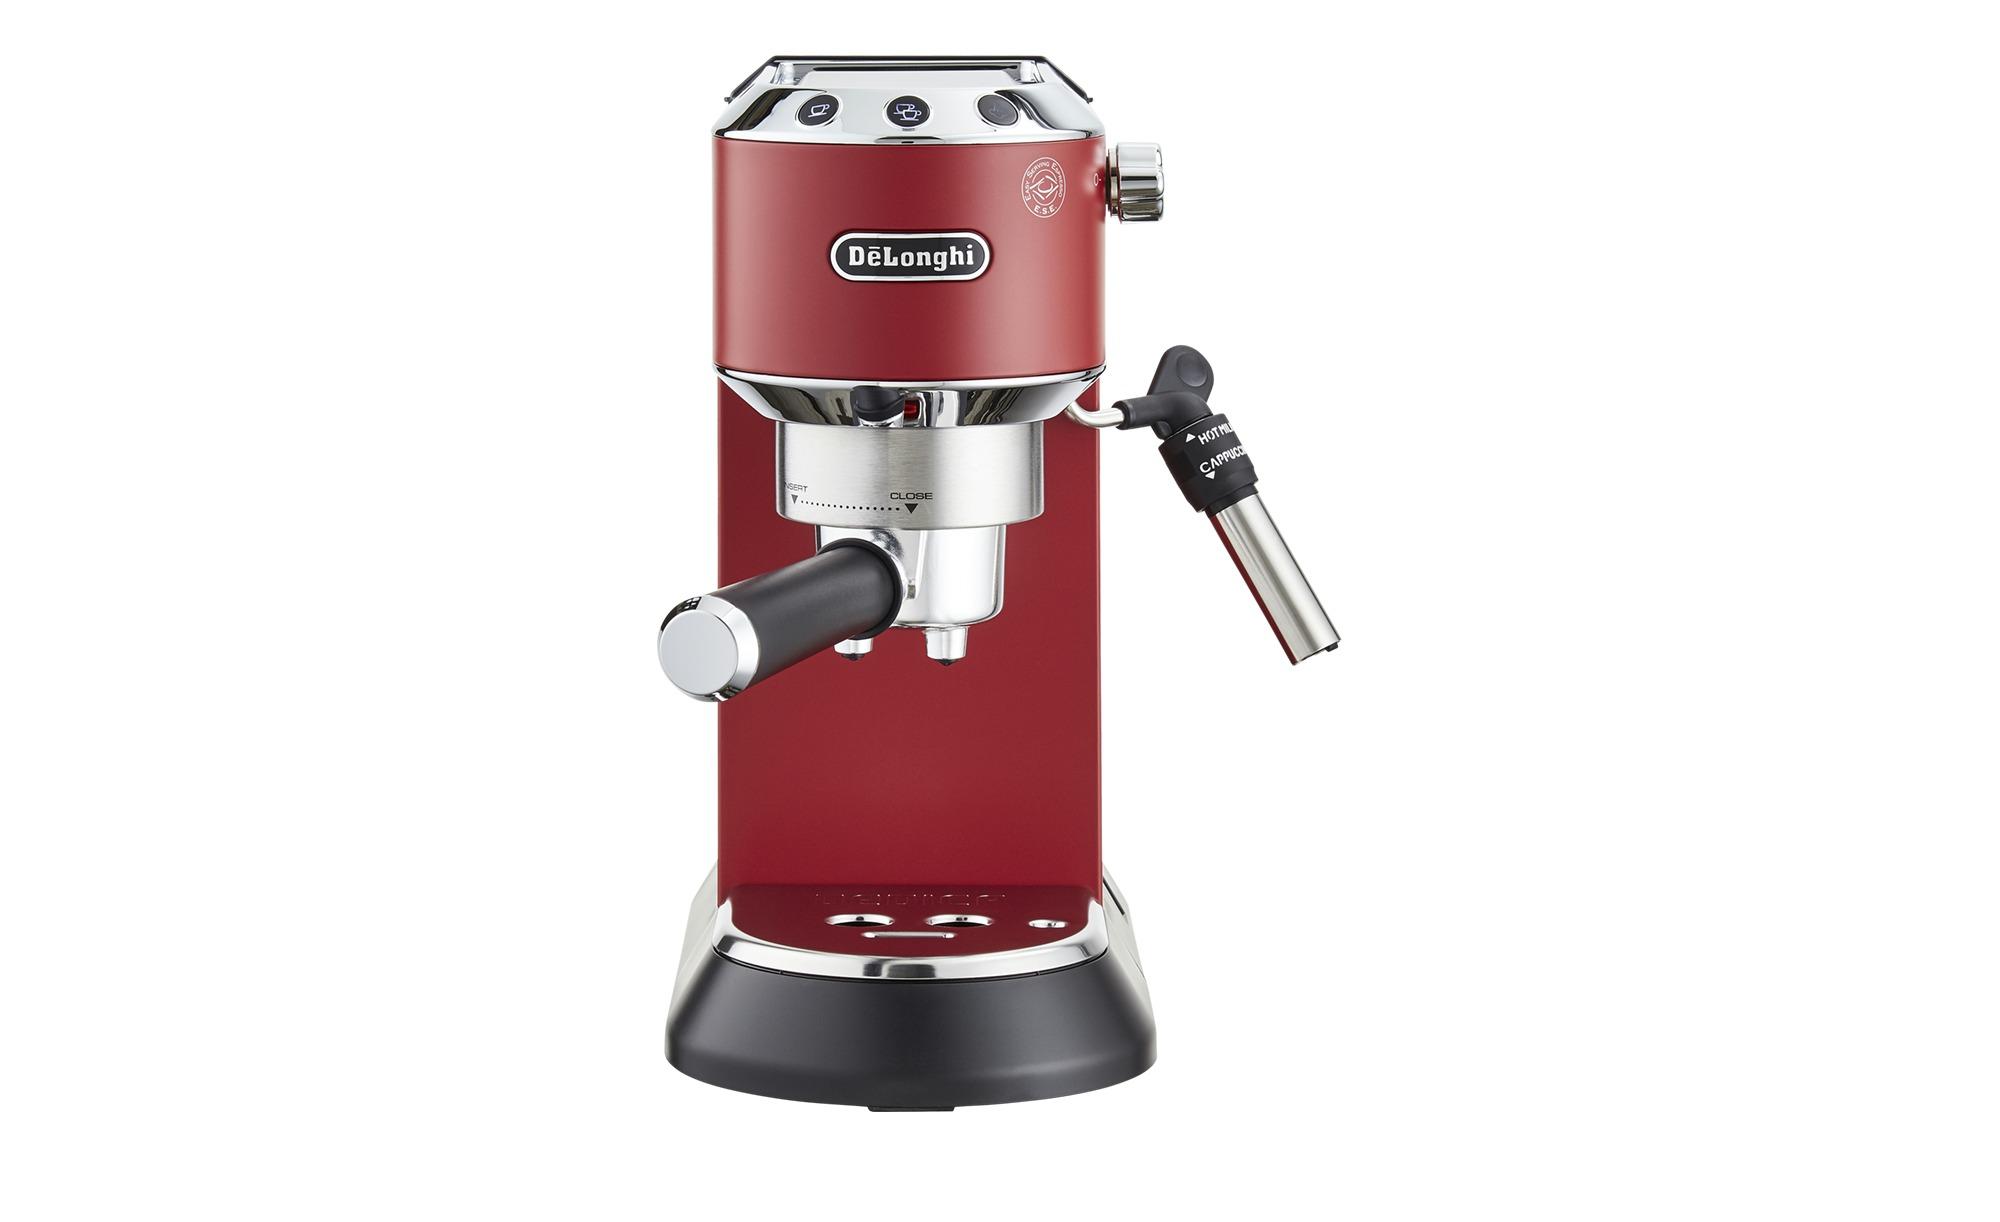 DeLonghi Espresso-Maschine  EC 685.R Dedica - rot - Kunststoff, Metall, Metall-lackiert - 14,9 cm - 30,5 cm - 33 cm - Elektrokleingeräte > Kaffee & Espressomaschinen - Möbel Kraft